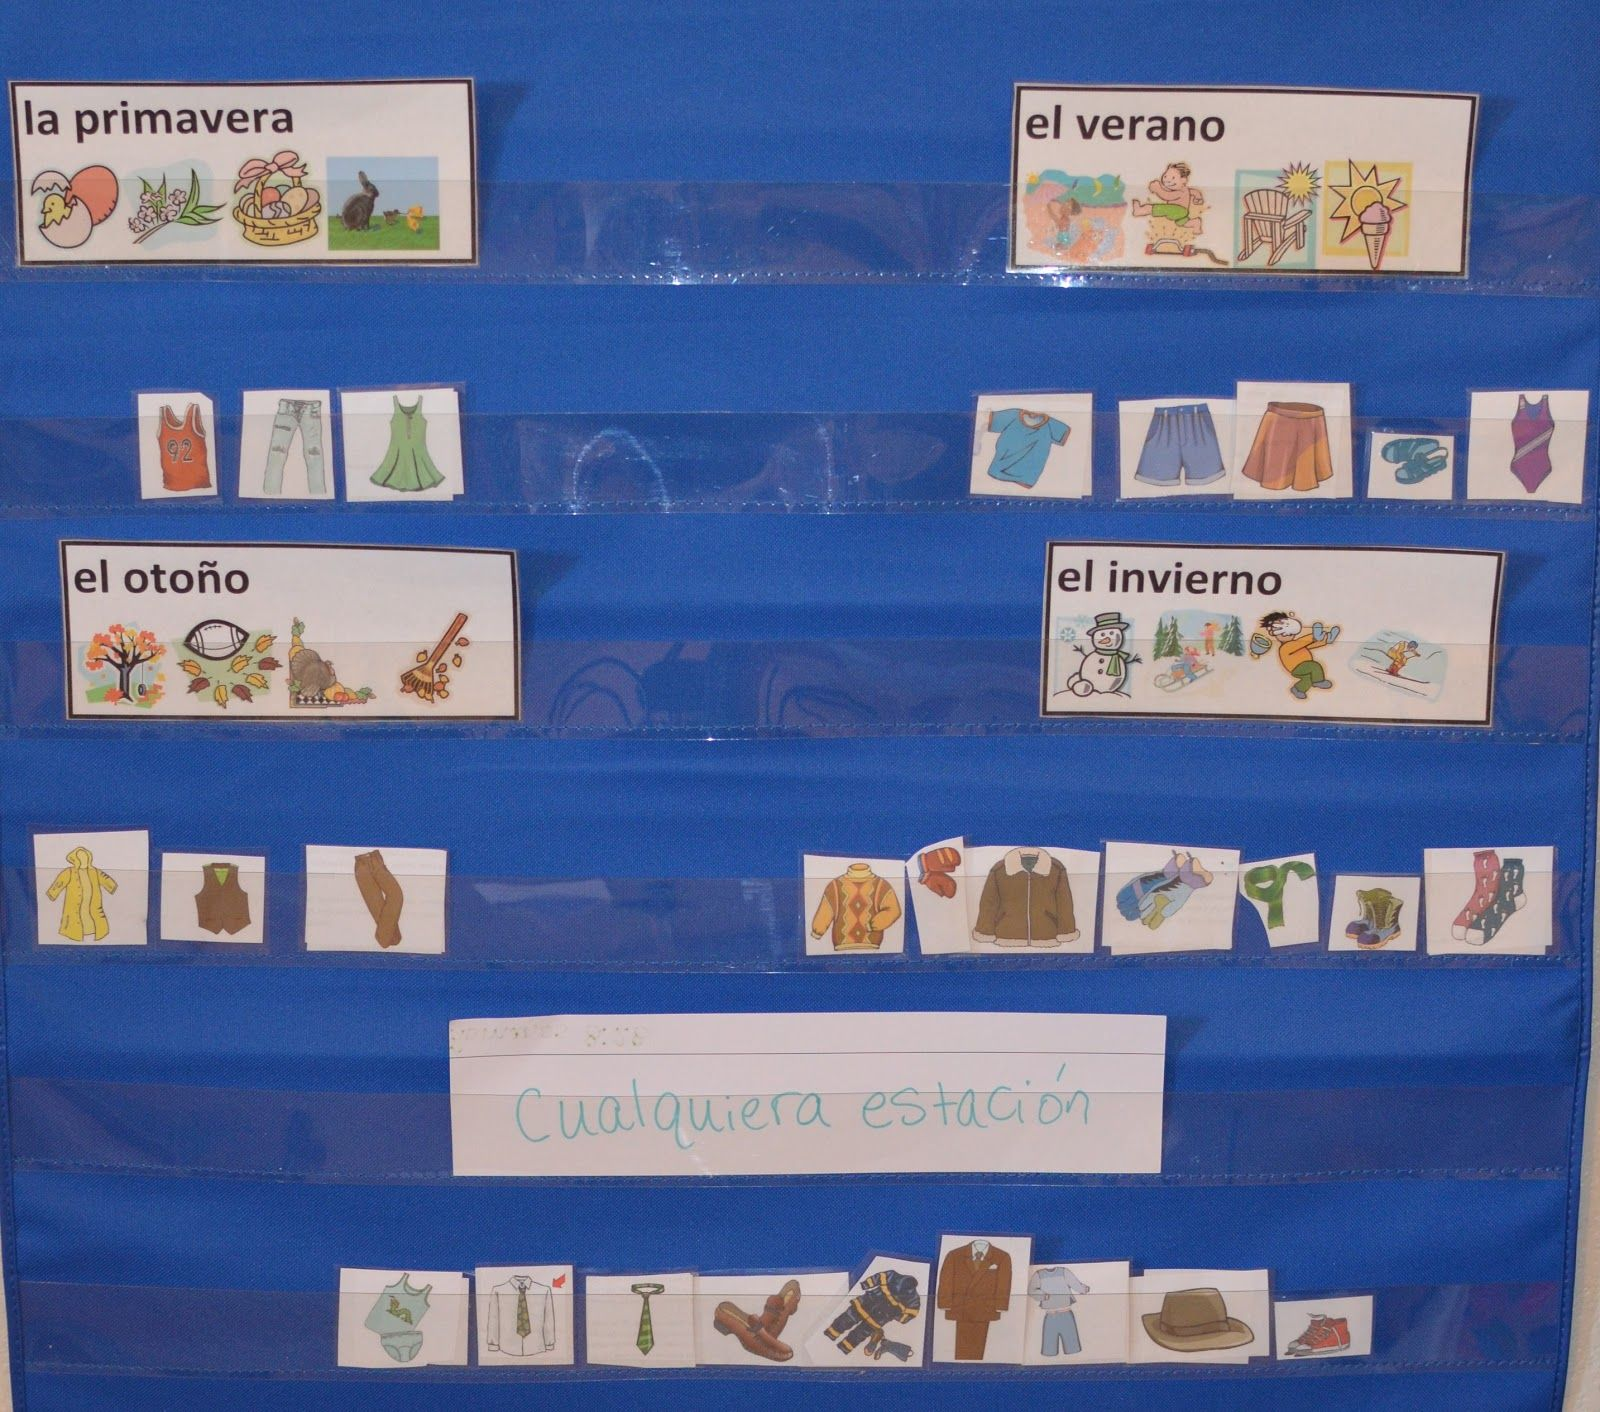 La Ropa Clothing Lesson Plan Lesson Plans Spanish Activities